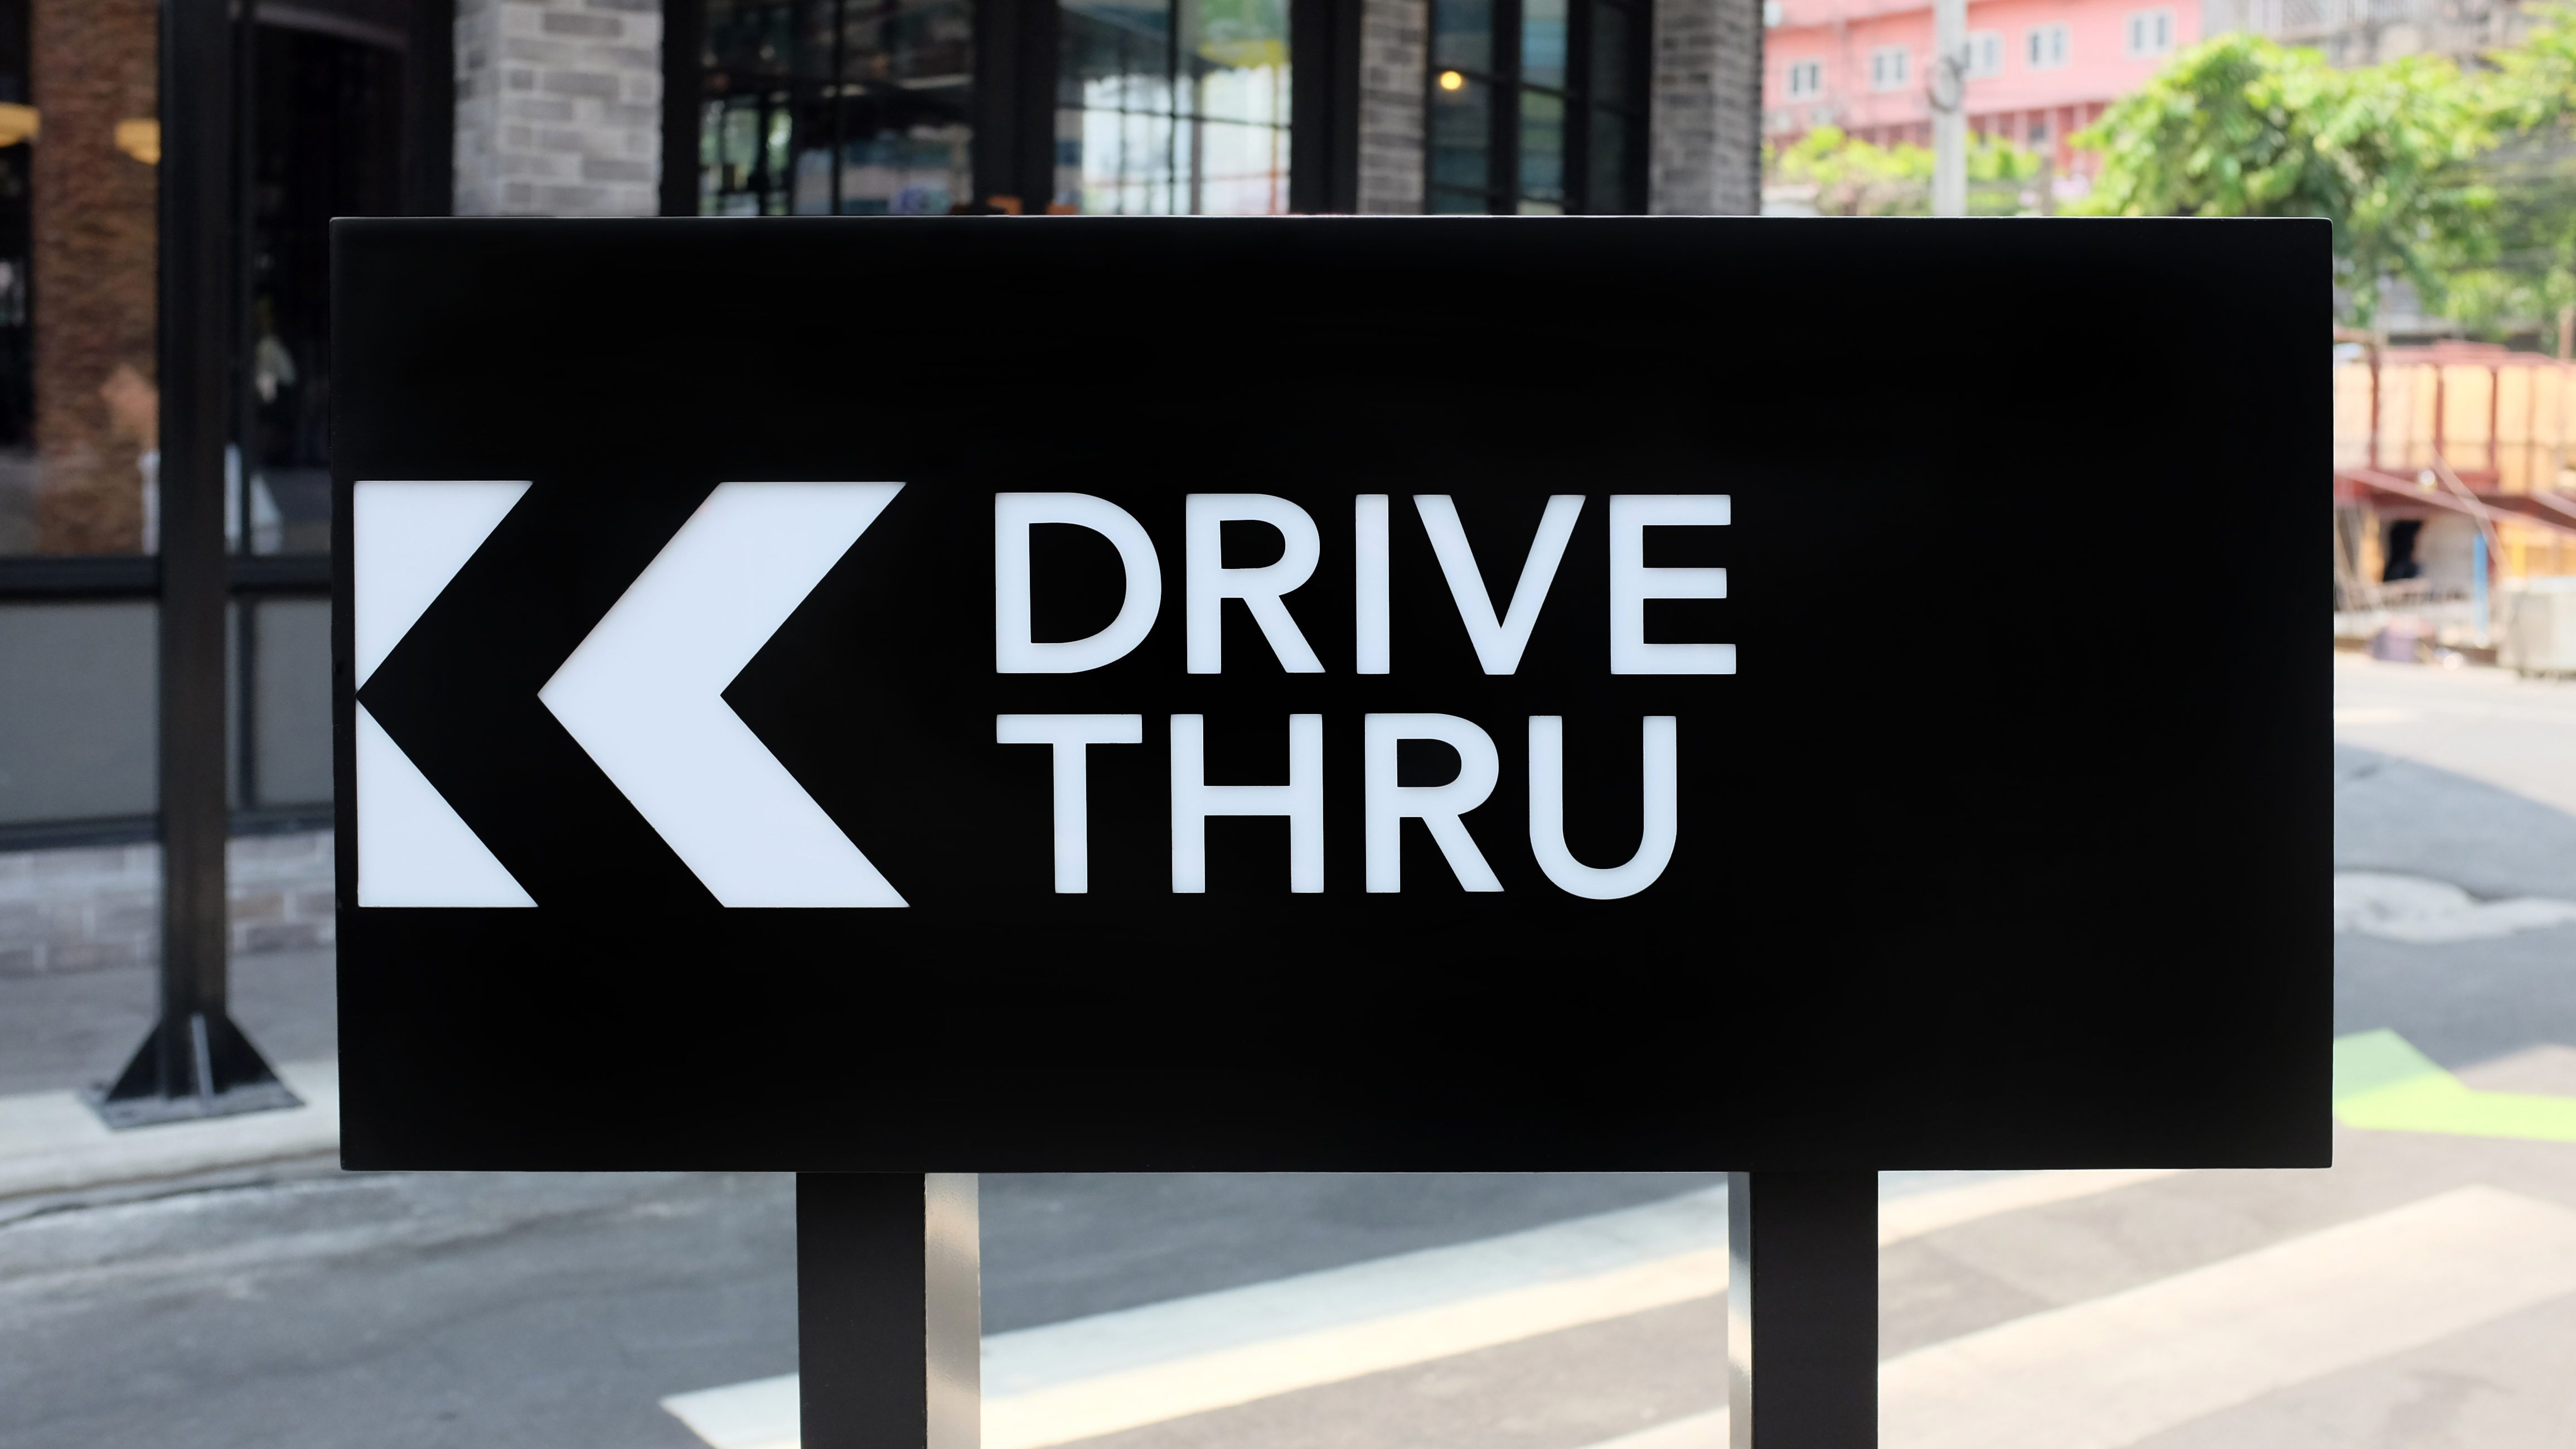 Drive thru sign board